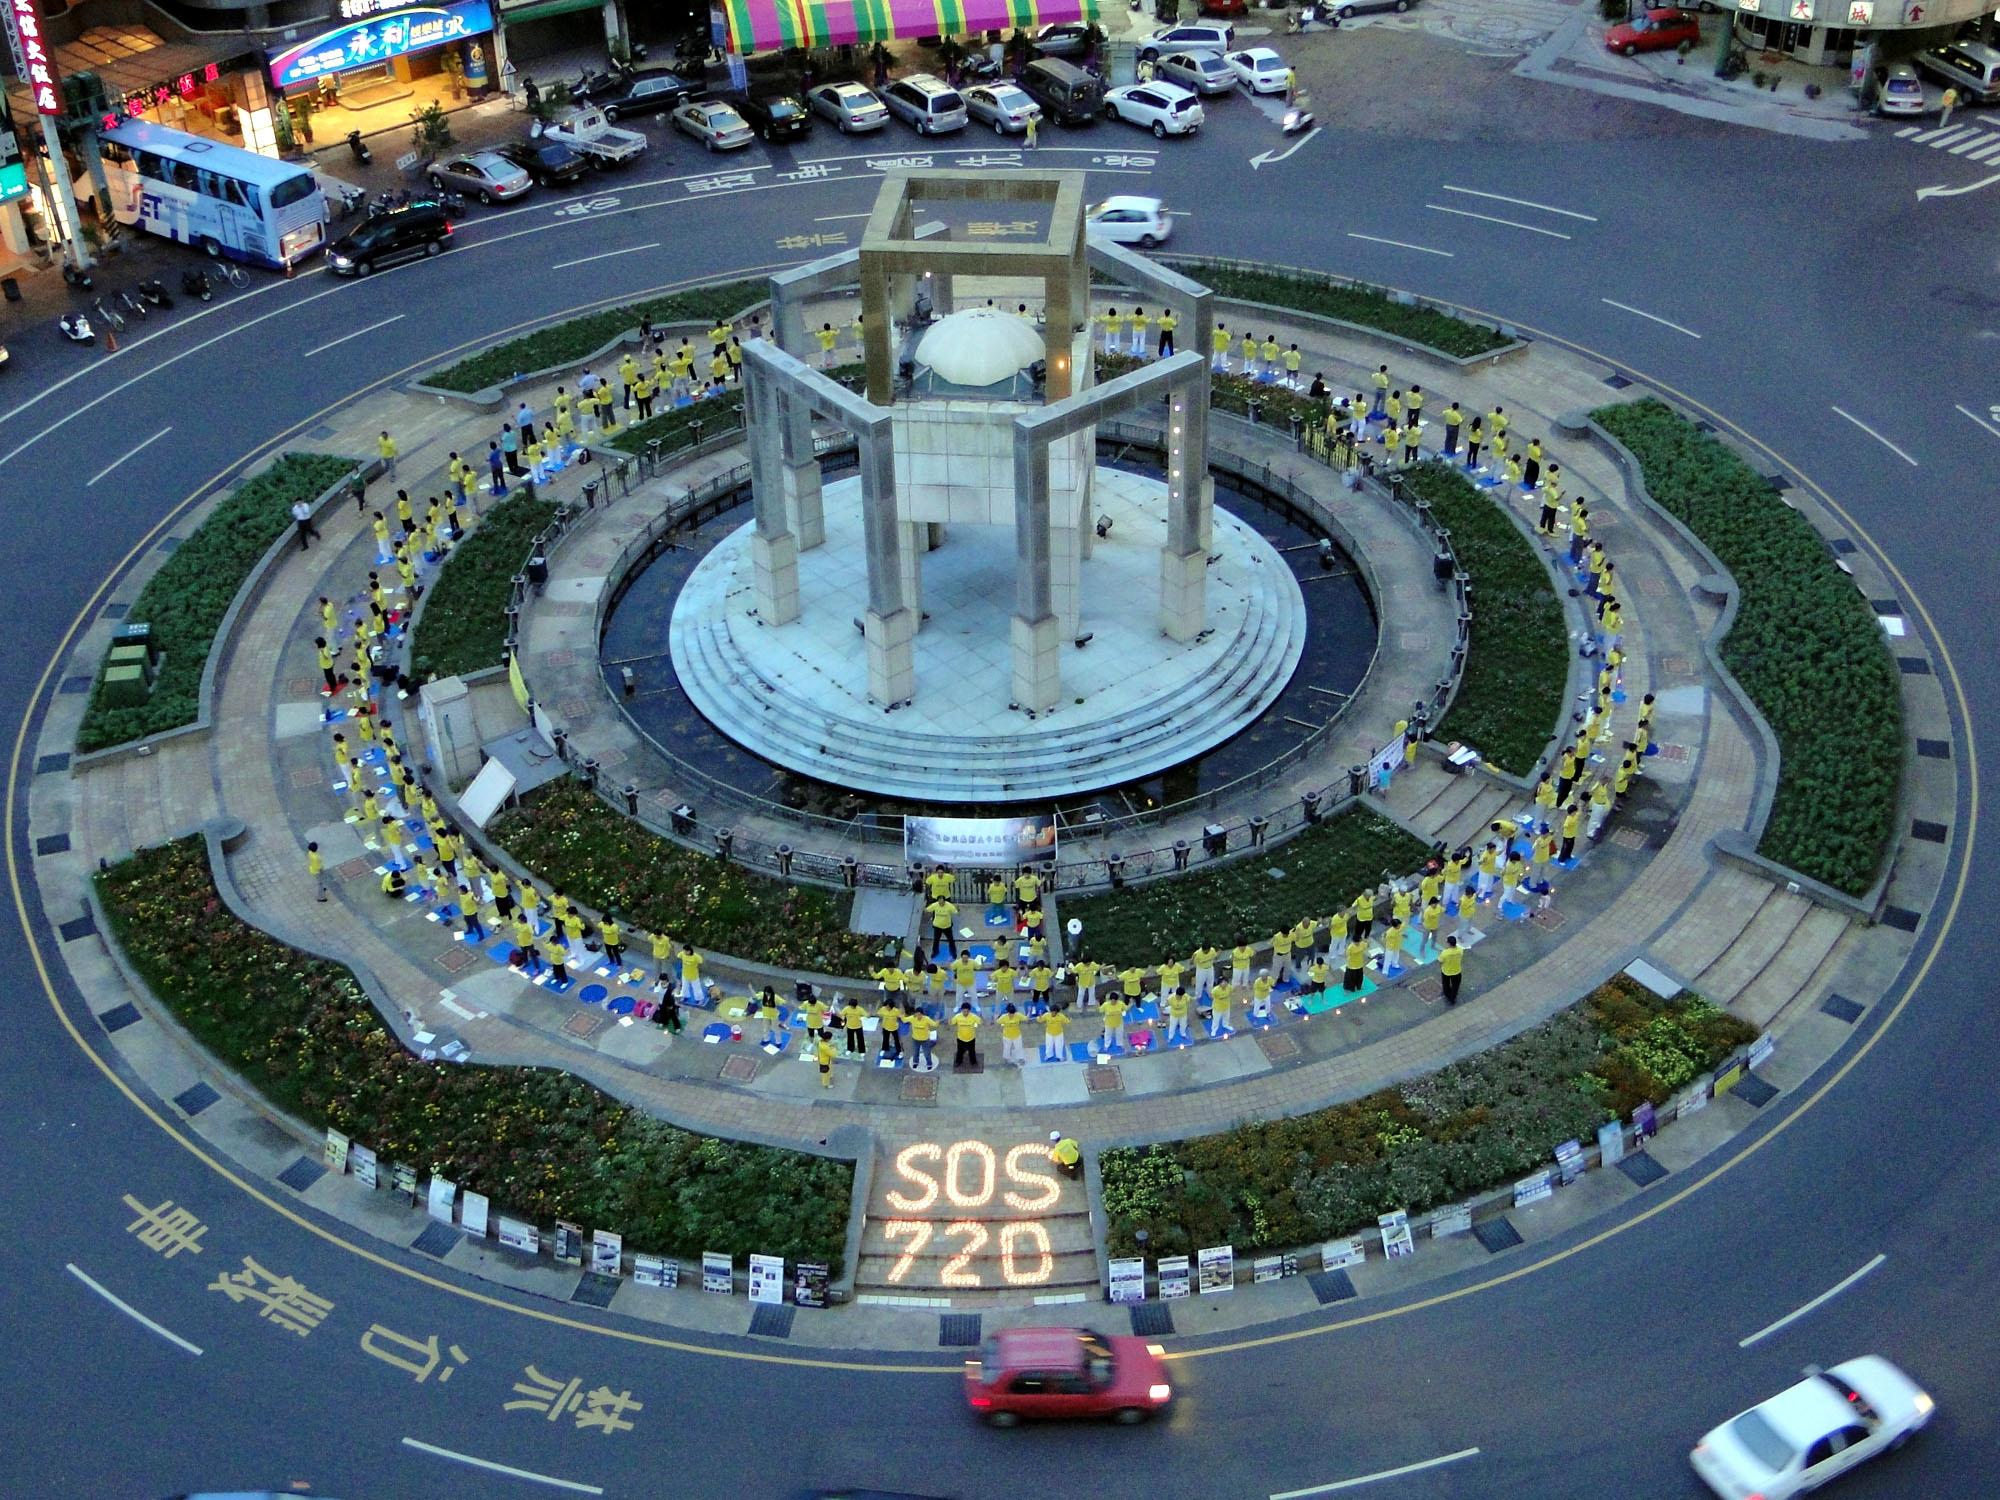 Yunlin Taiwan  city pictures gallery : Taiwan: Yunlin Legislators and Council Members Support Falun Gong at ...